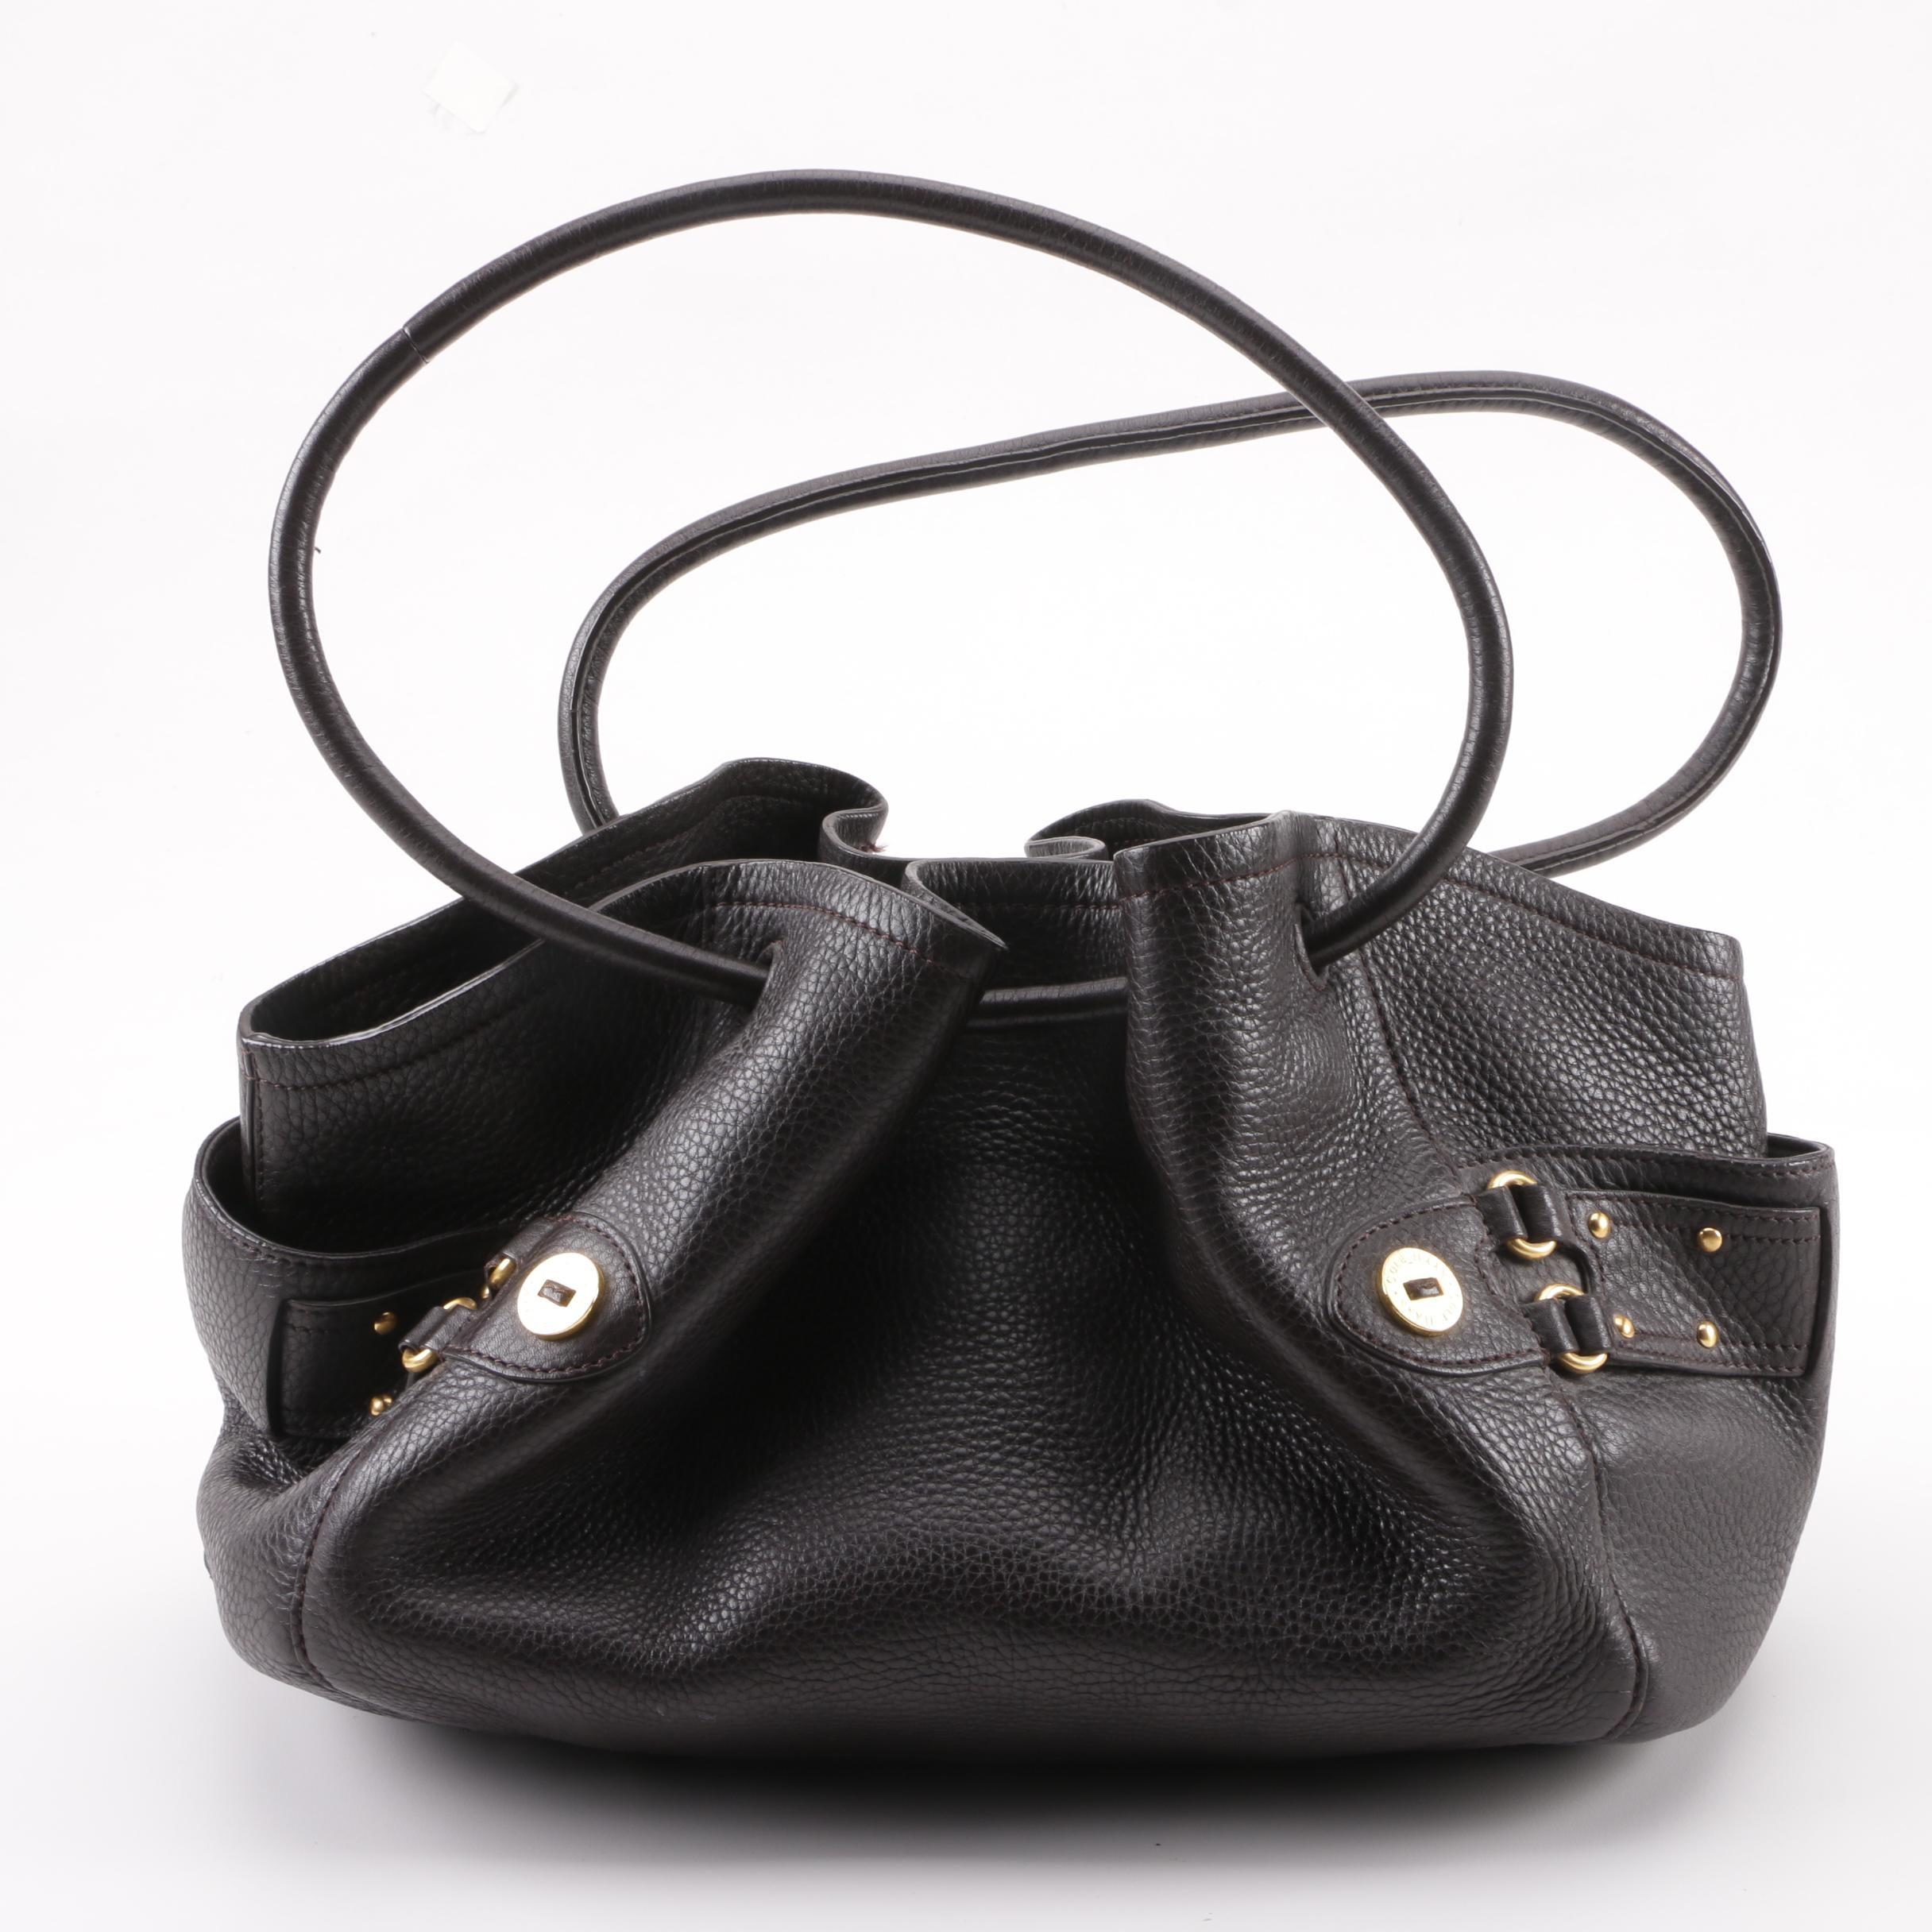 Cole Haan Dark Brown Pebbled Leather Shoulder Bag